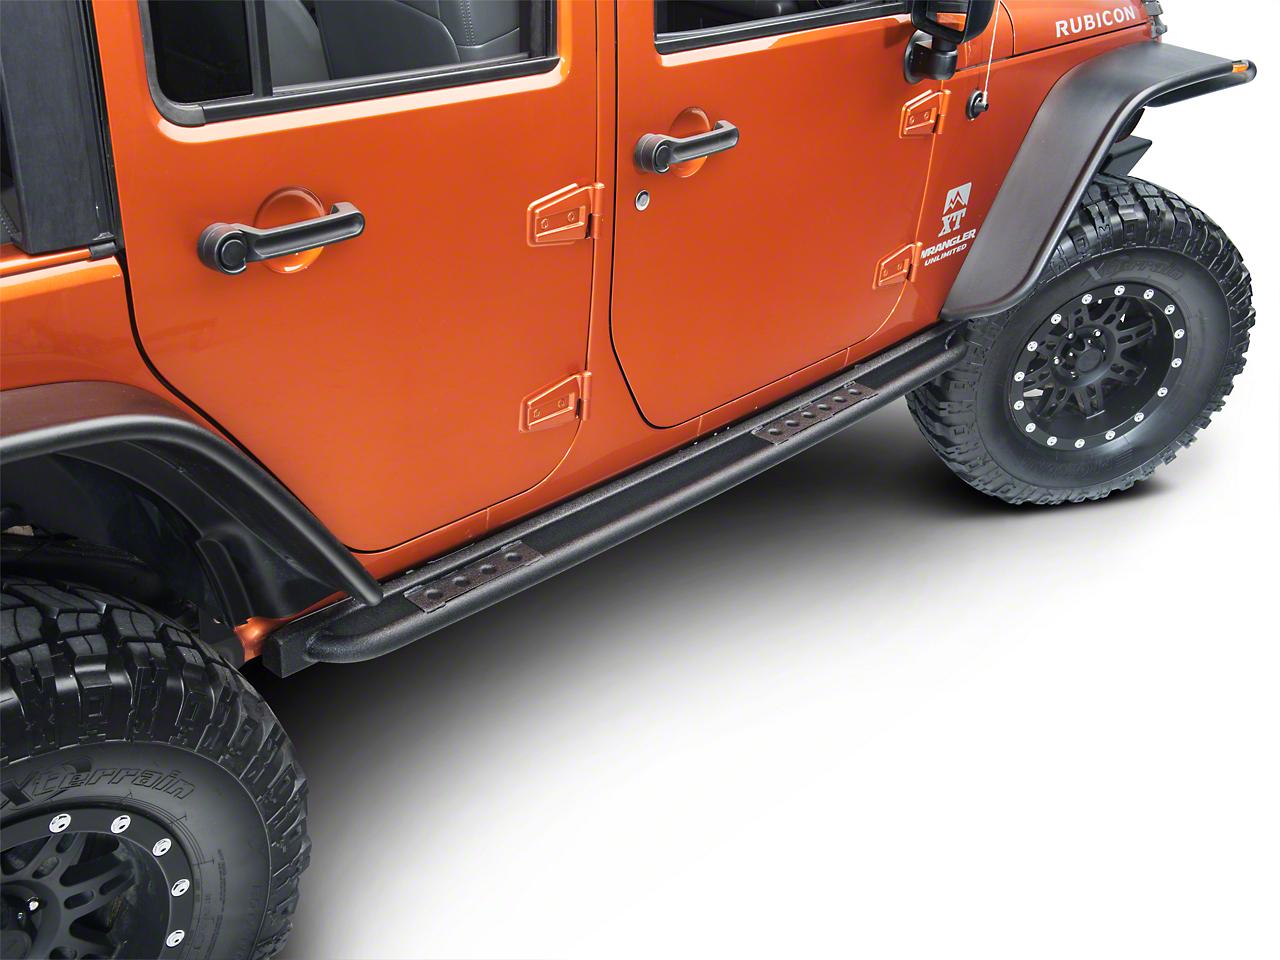 Smittybilt SRC Classic Rock Rails (OEM Style) W/ Step- Black Textured (07-16 Wrangler JK 4 Door)